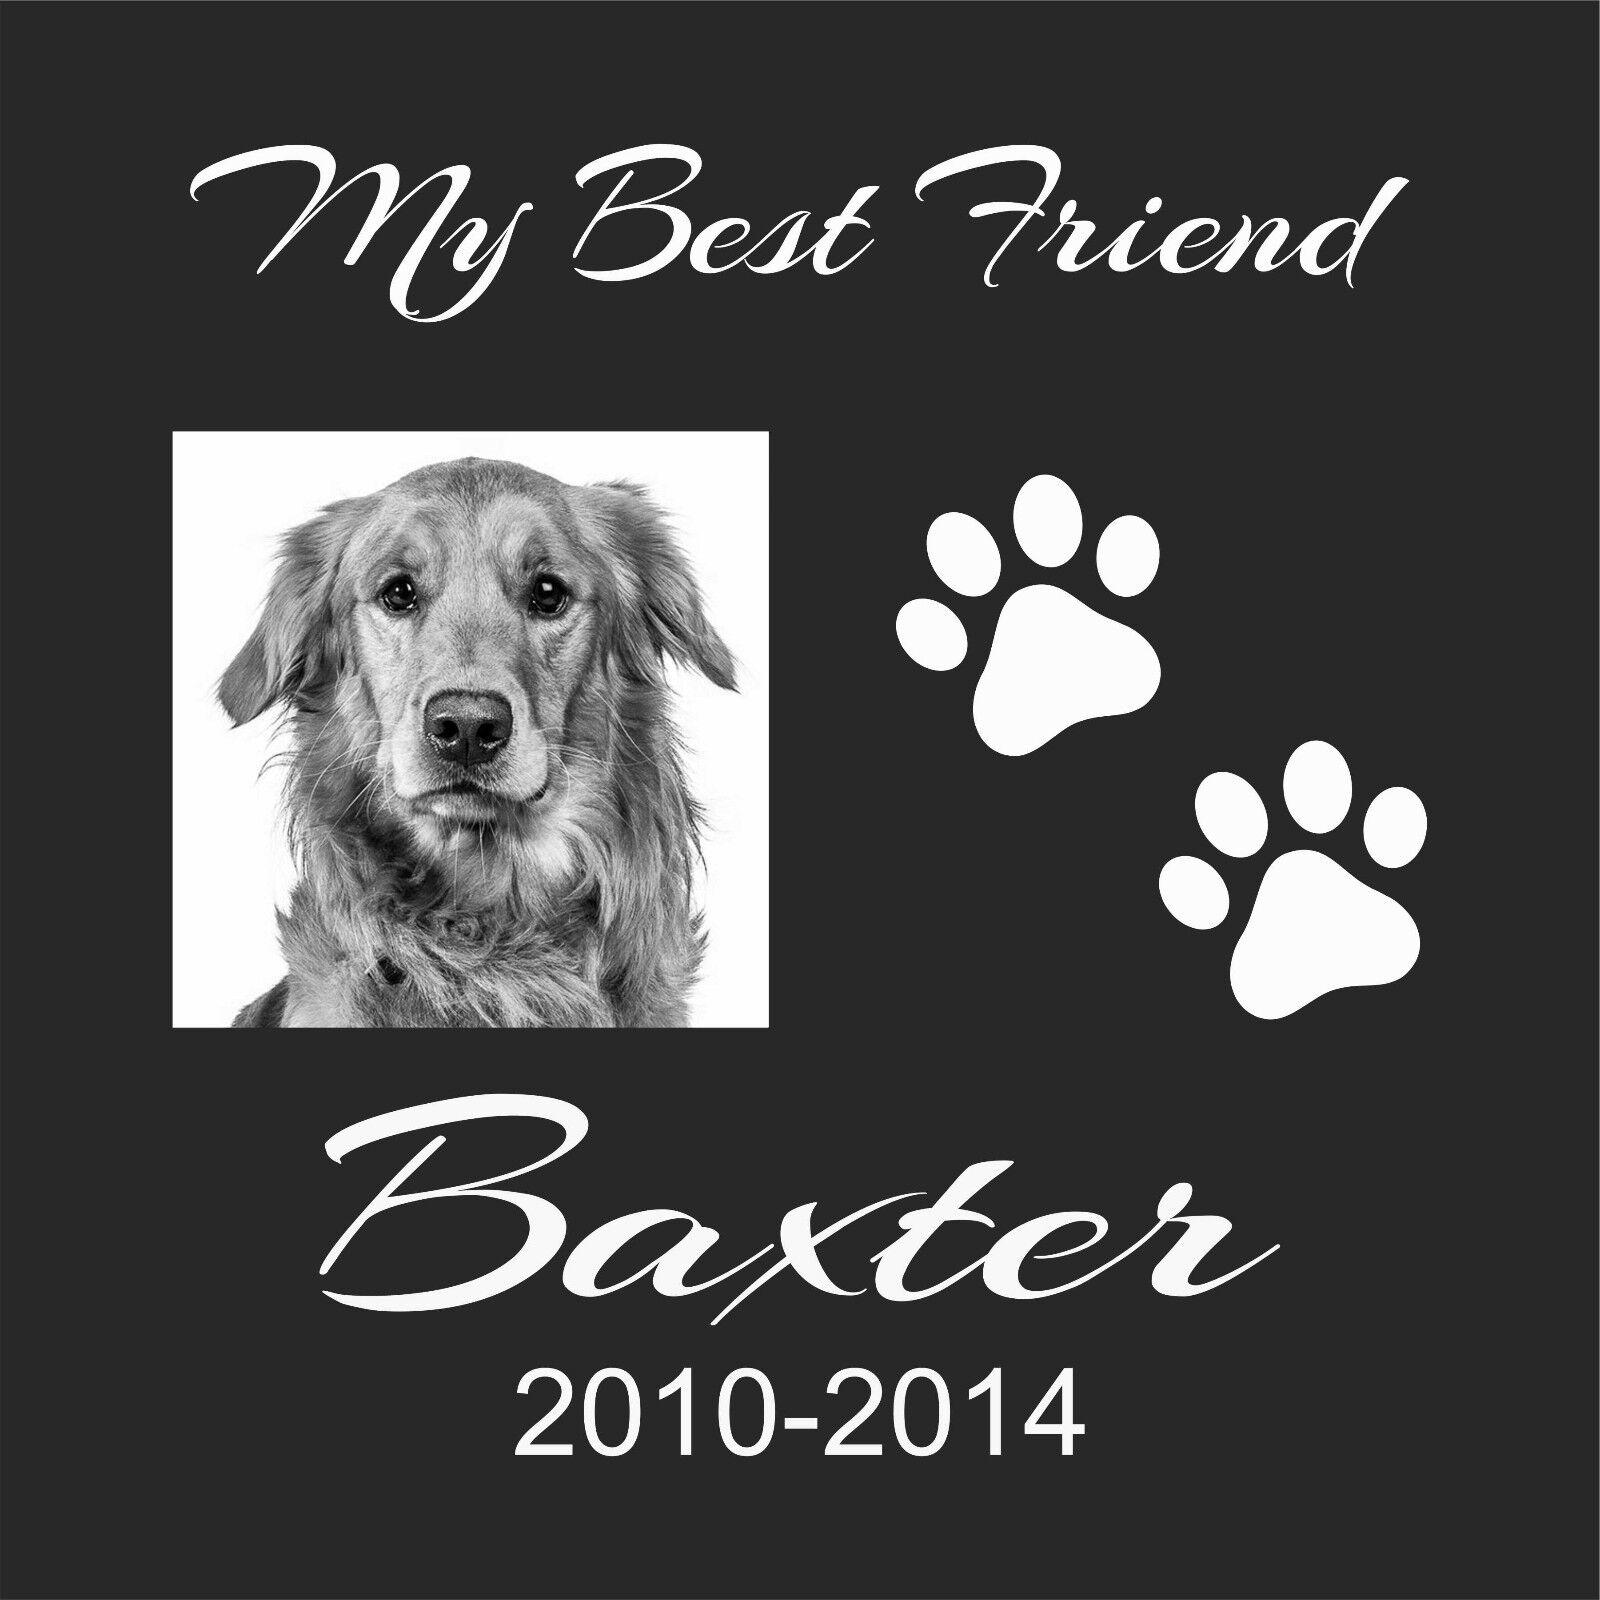 Personalized Pet Human grave marker Stone Memorial 12  x 12  Great Dane Mastiff